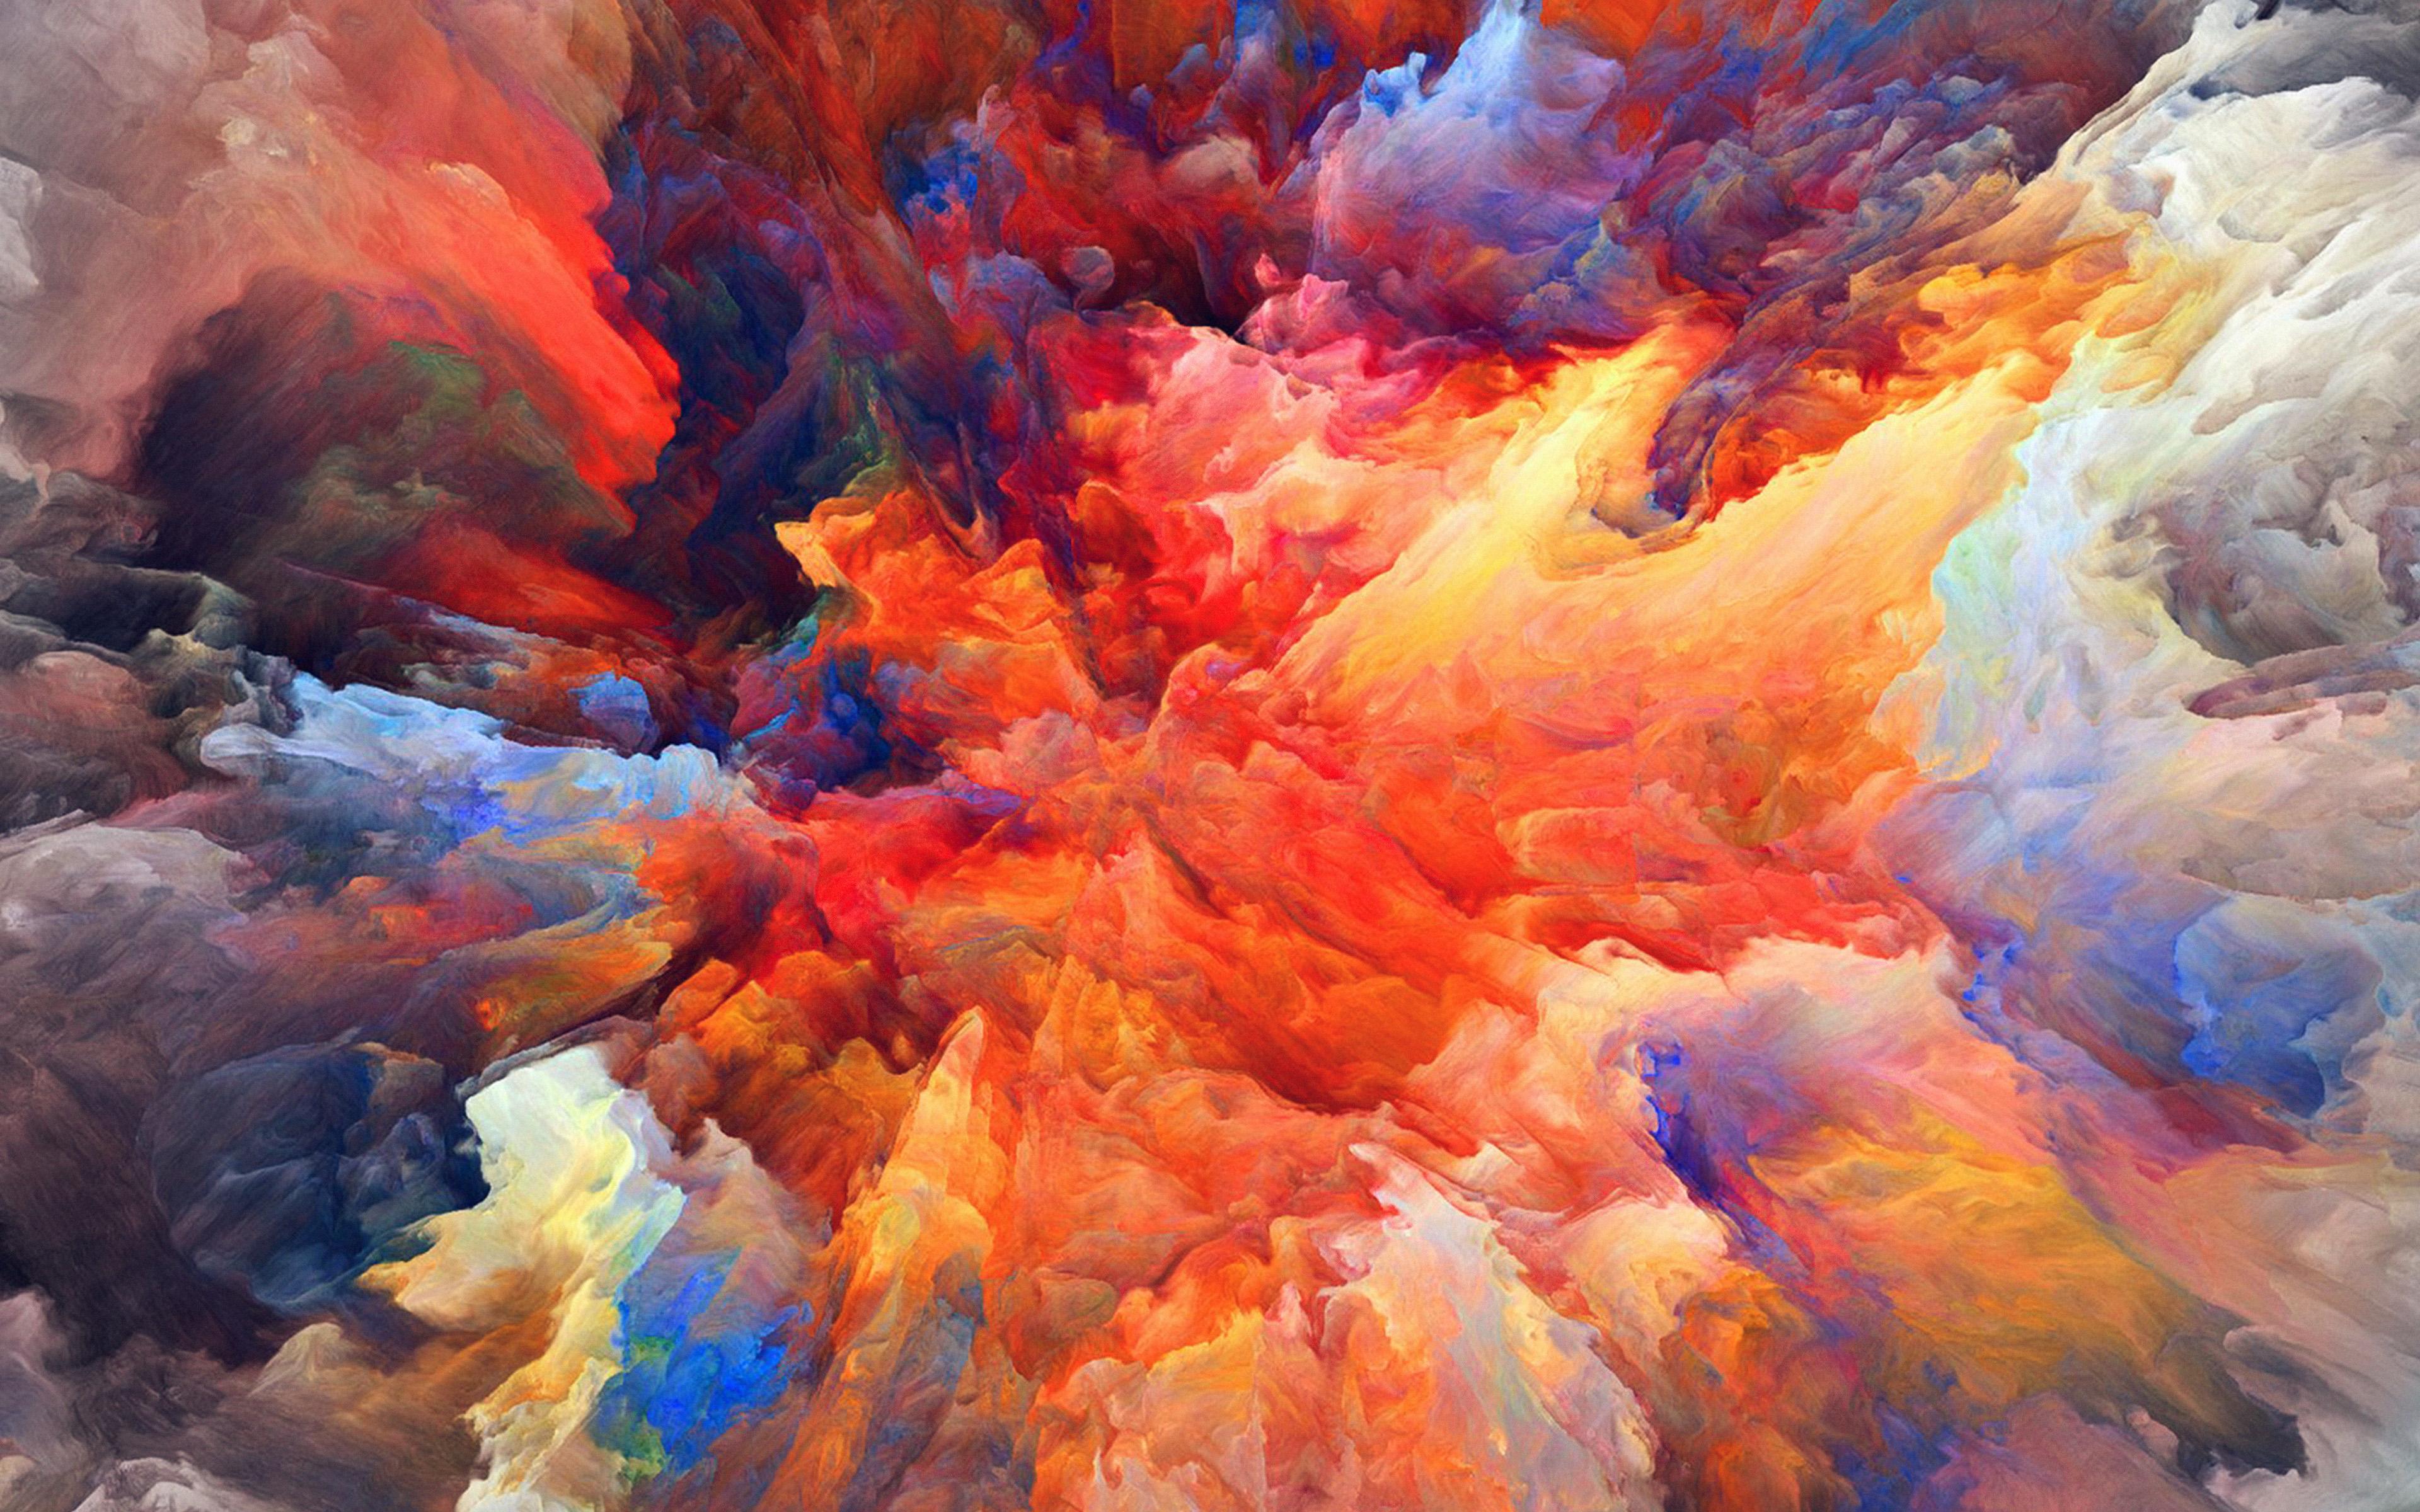 5k wallpapers for imac retina